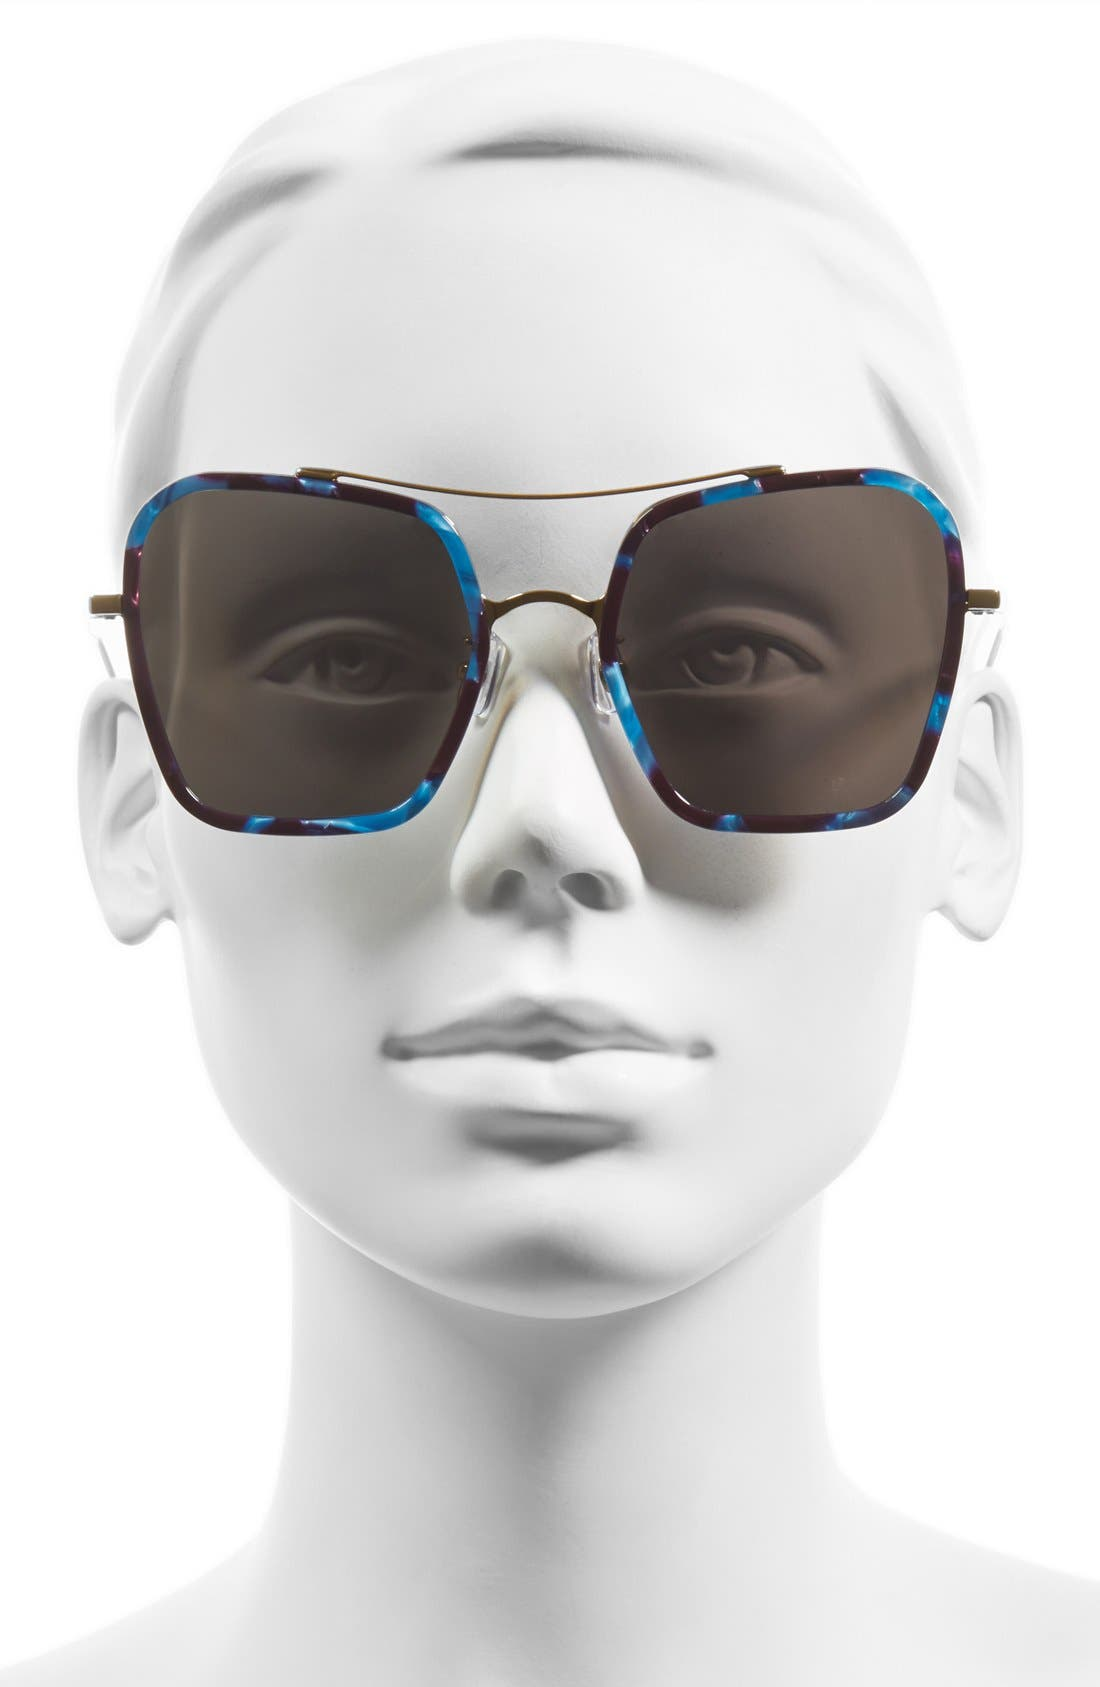 53mm Retro Square Sunglasses,                             Alternate thumbnail 6, color,